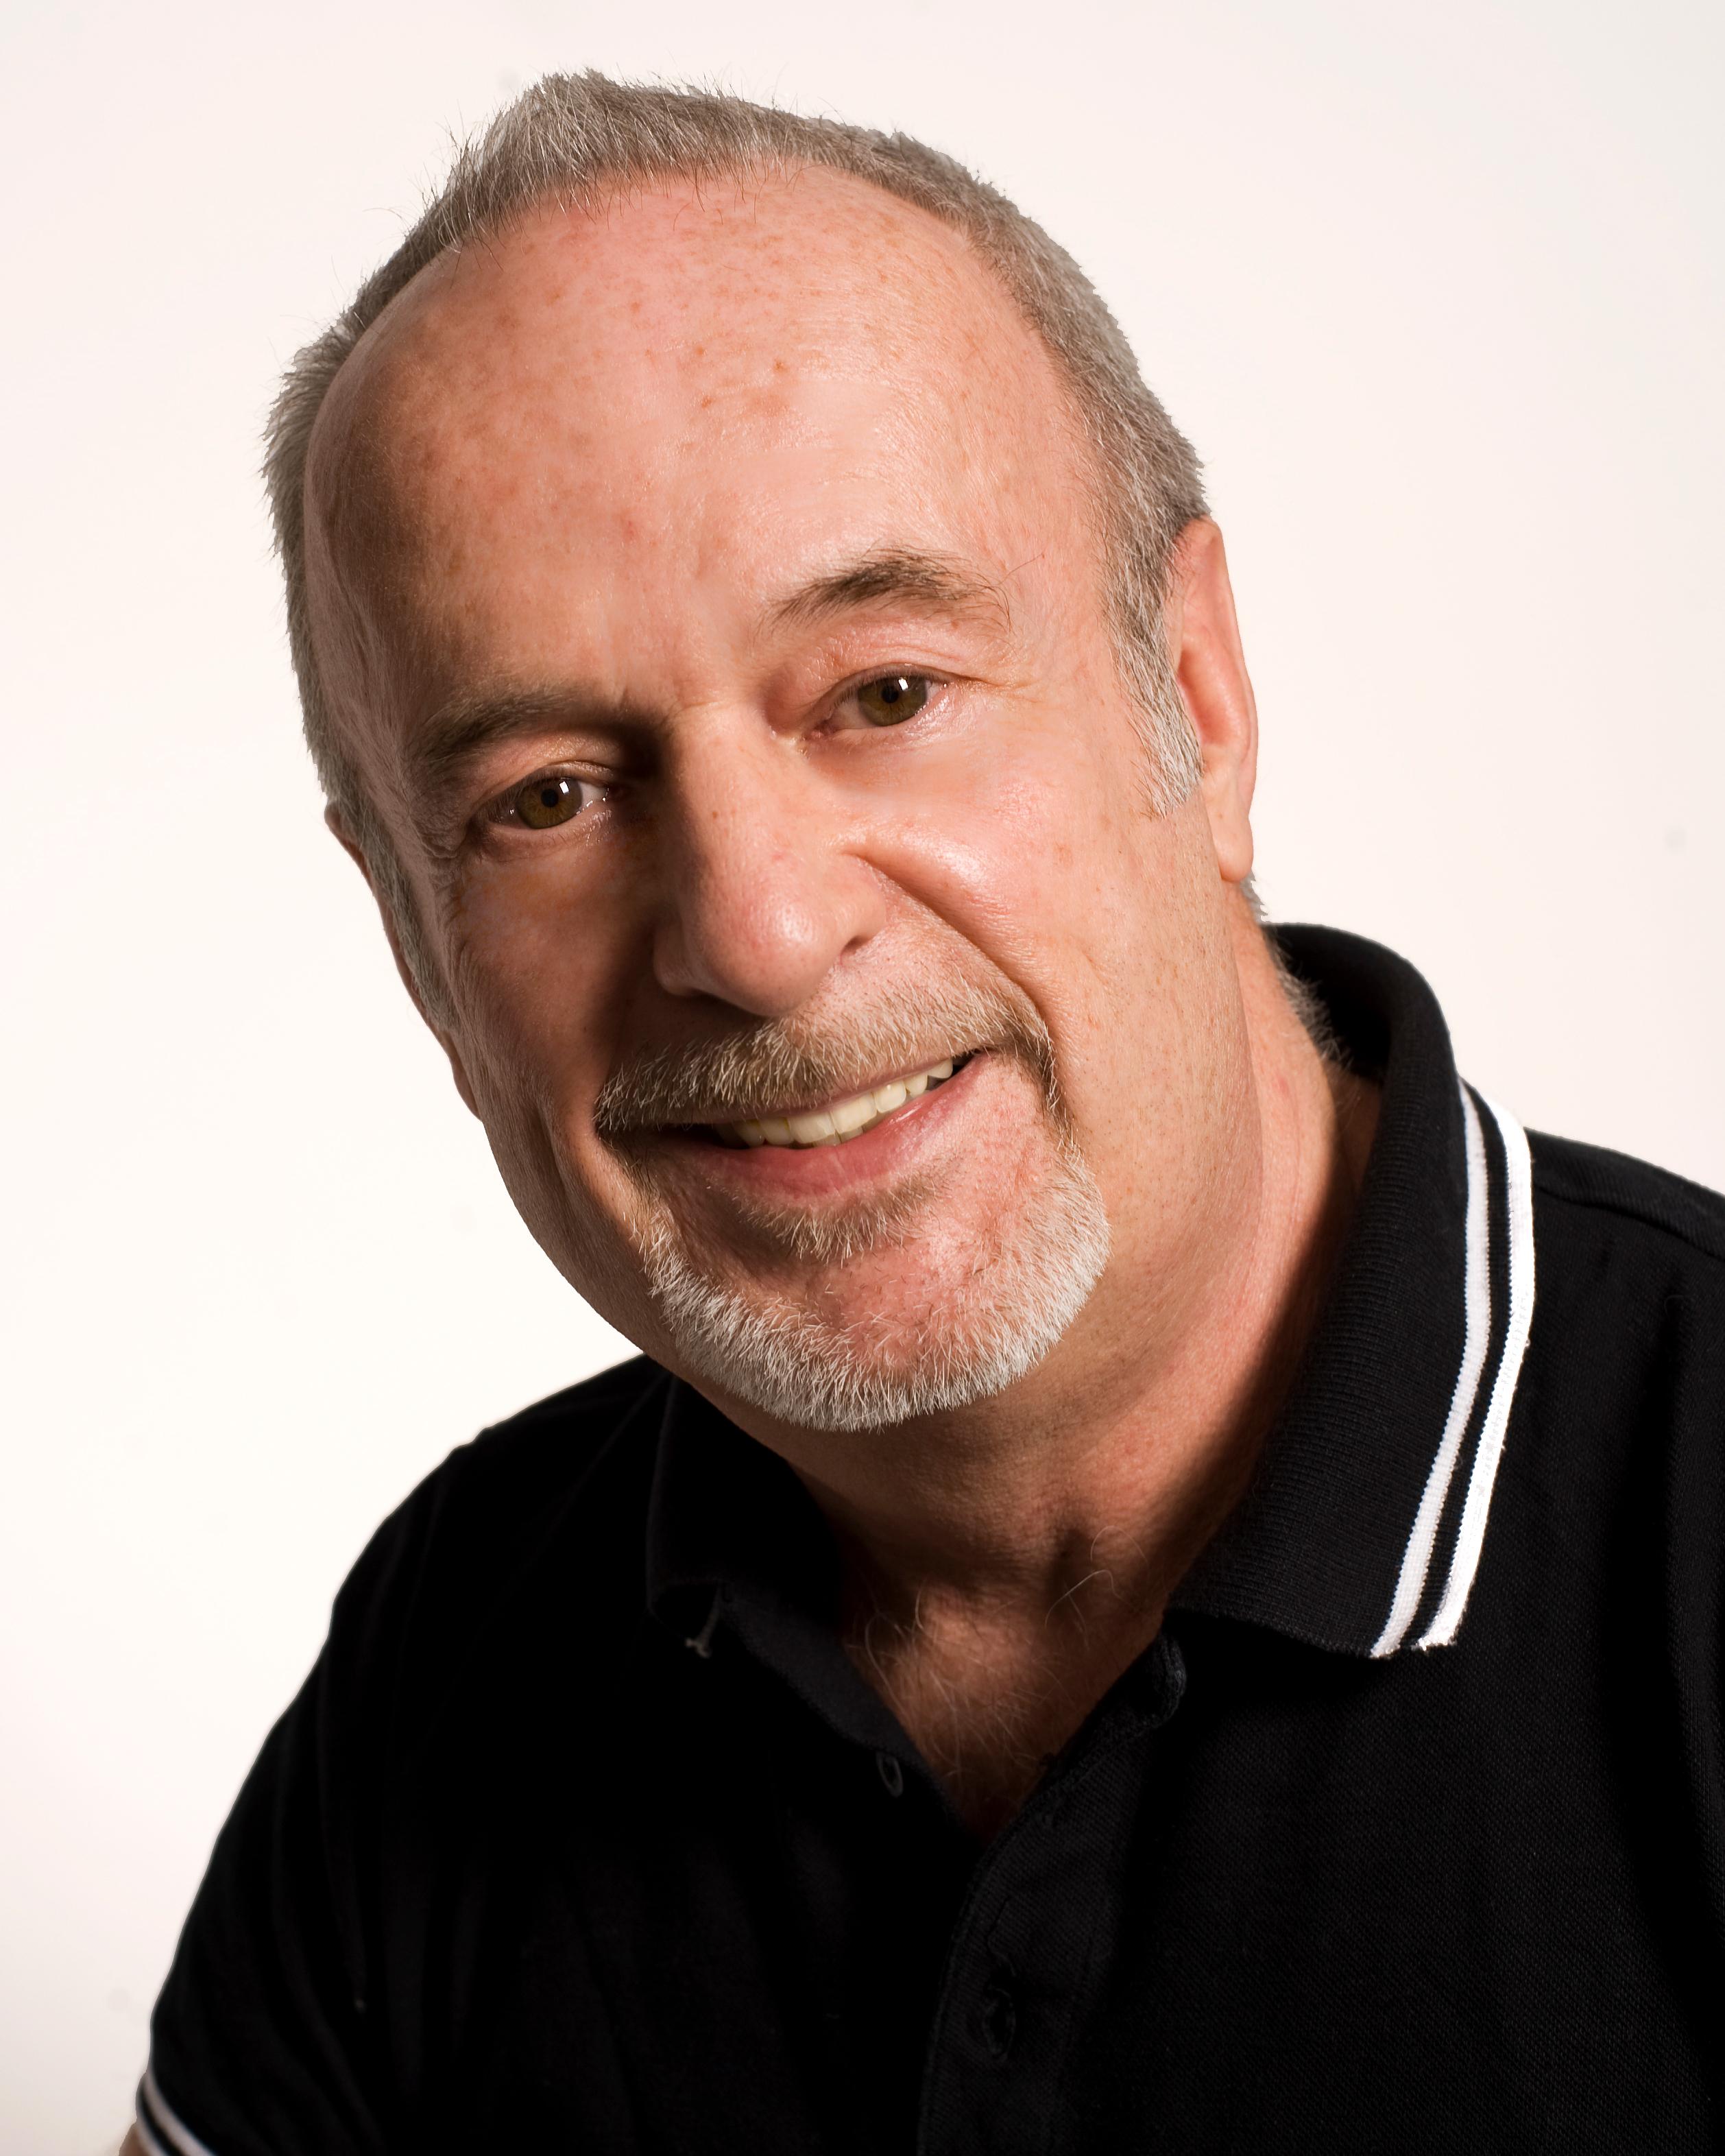 Carl Bognar